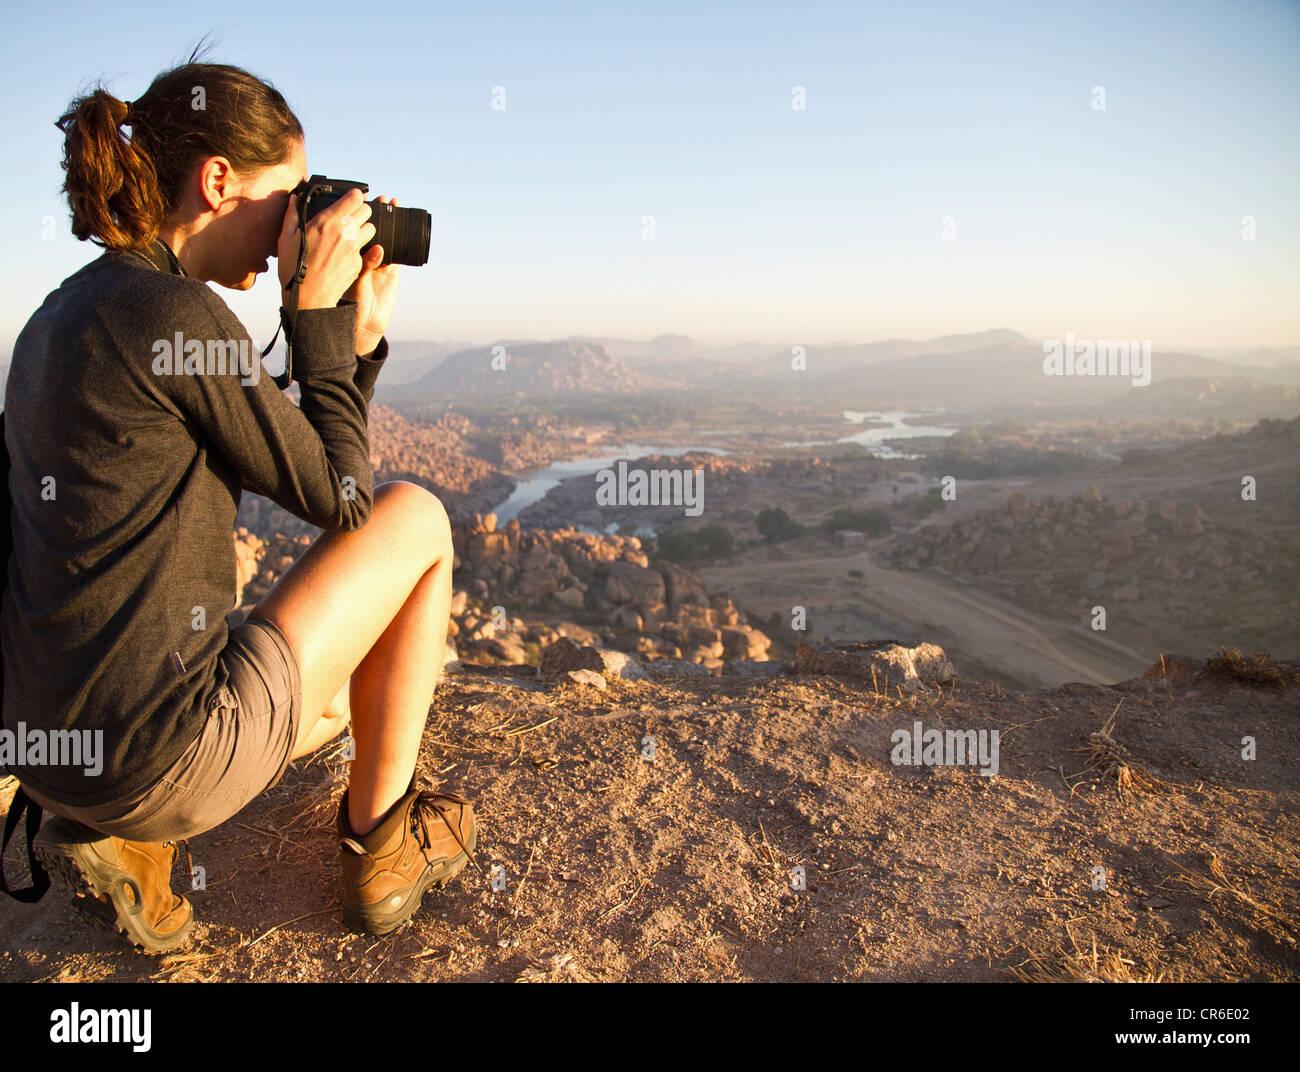 La India, Karnataka, jóvenes mujeres turistas fotografiando en la cima de la colina en Hampi Imagen De Stock